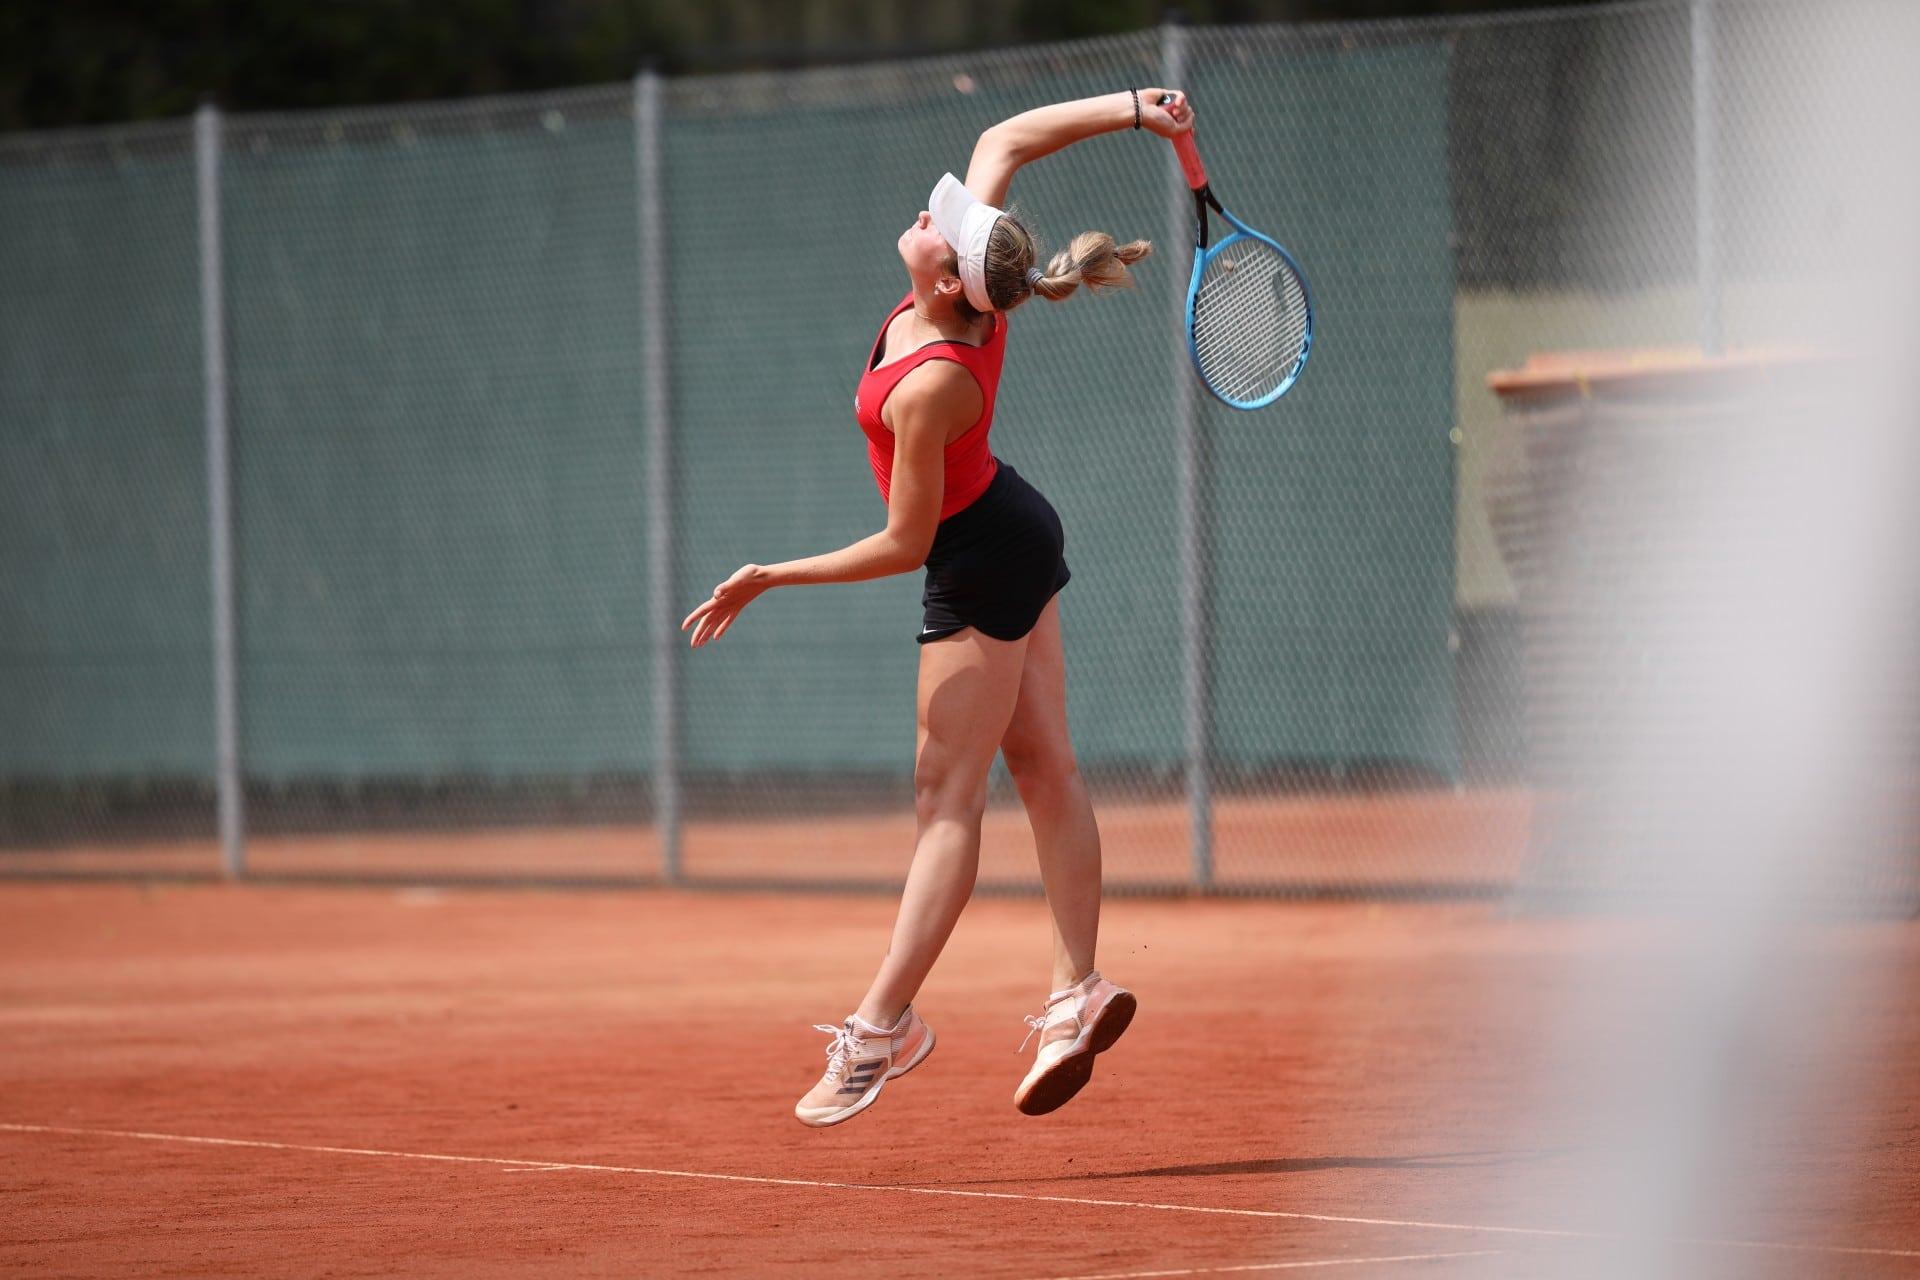 97-Bertram-Schaub-Photography-Sportfotos-hYpPzhqg